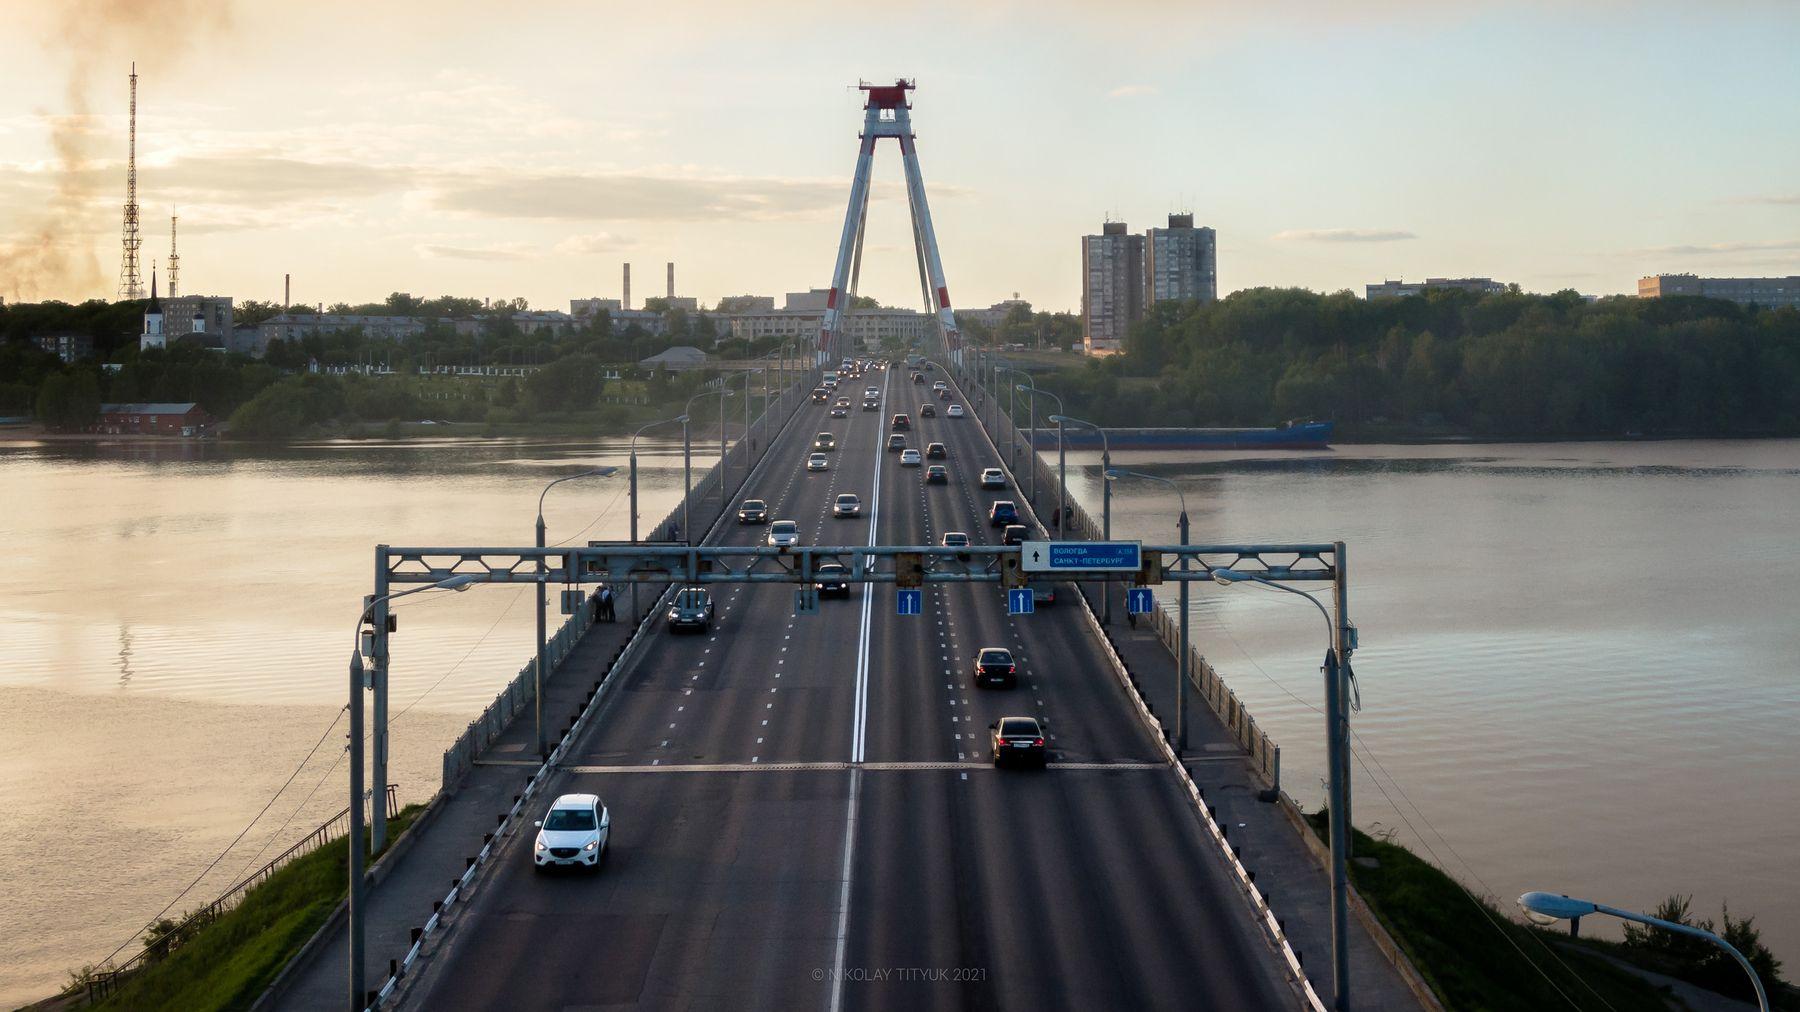 Череповец cherepovets bridge river water sky landscape cars traffic